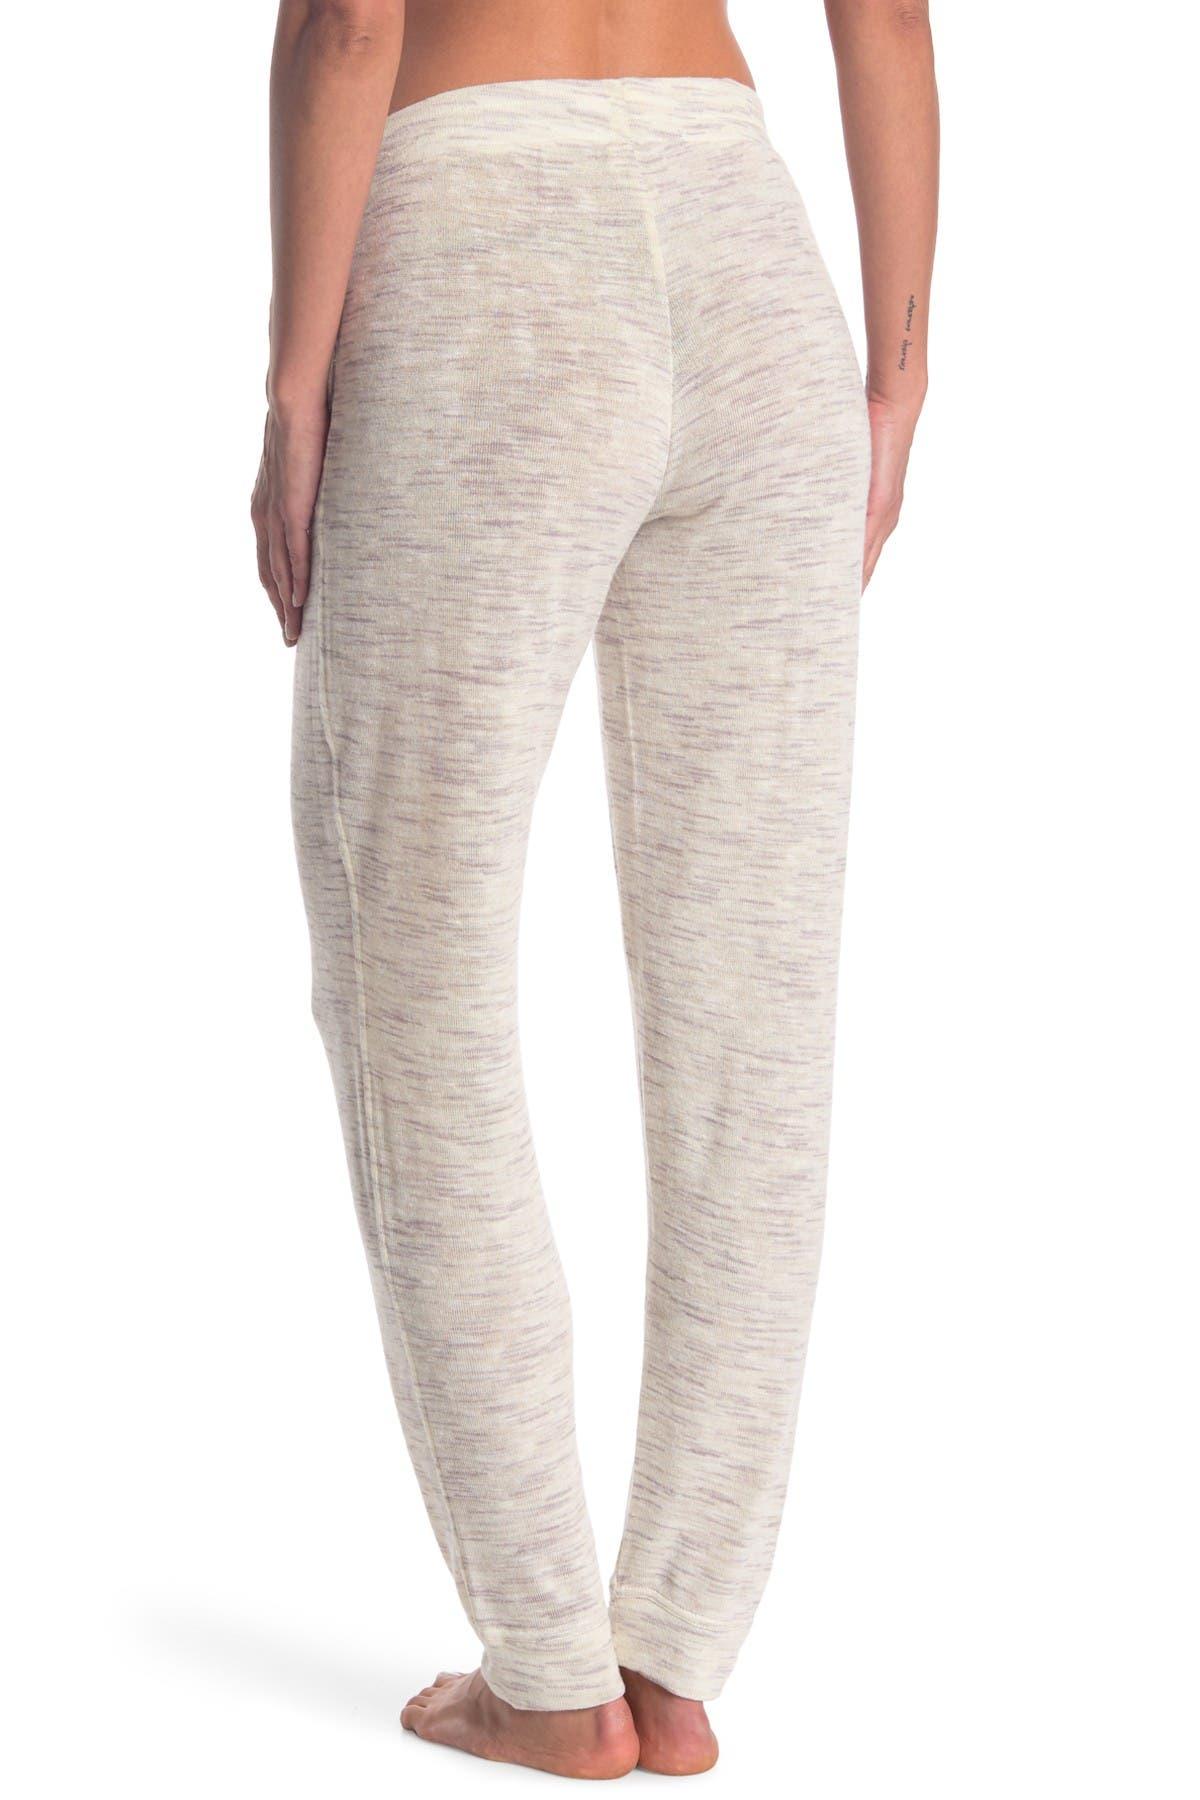 Image of HUE Space Dye Knit Cuffed Pajama Pants